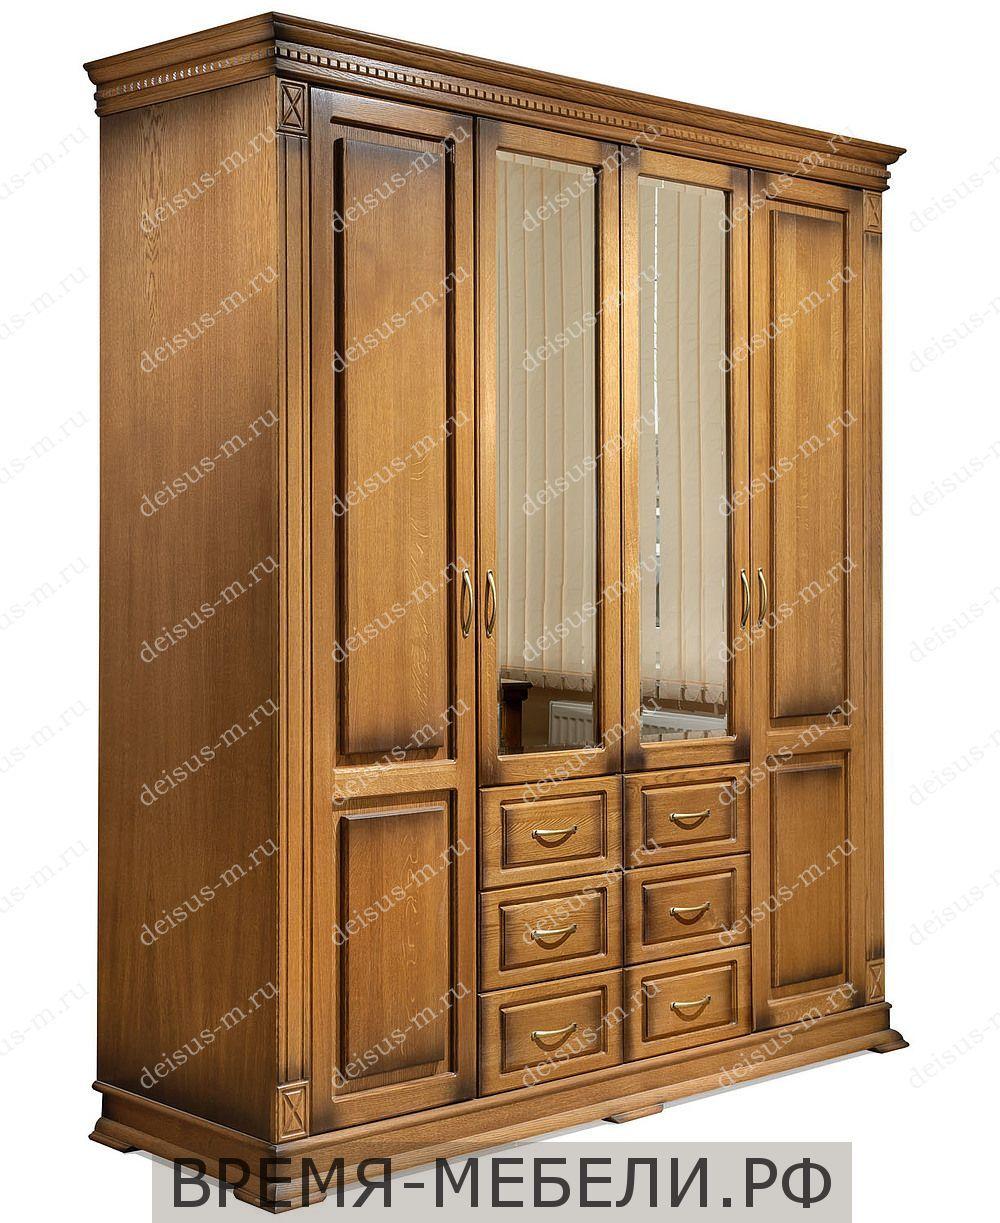 Шкаф четырехстворчатый Верди-М 1